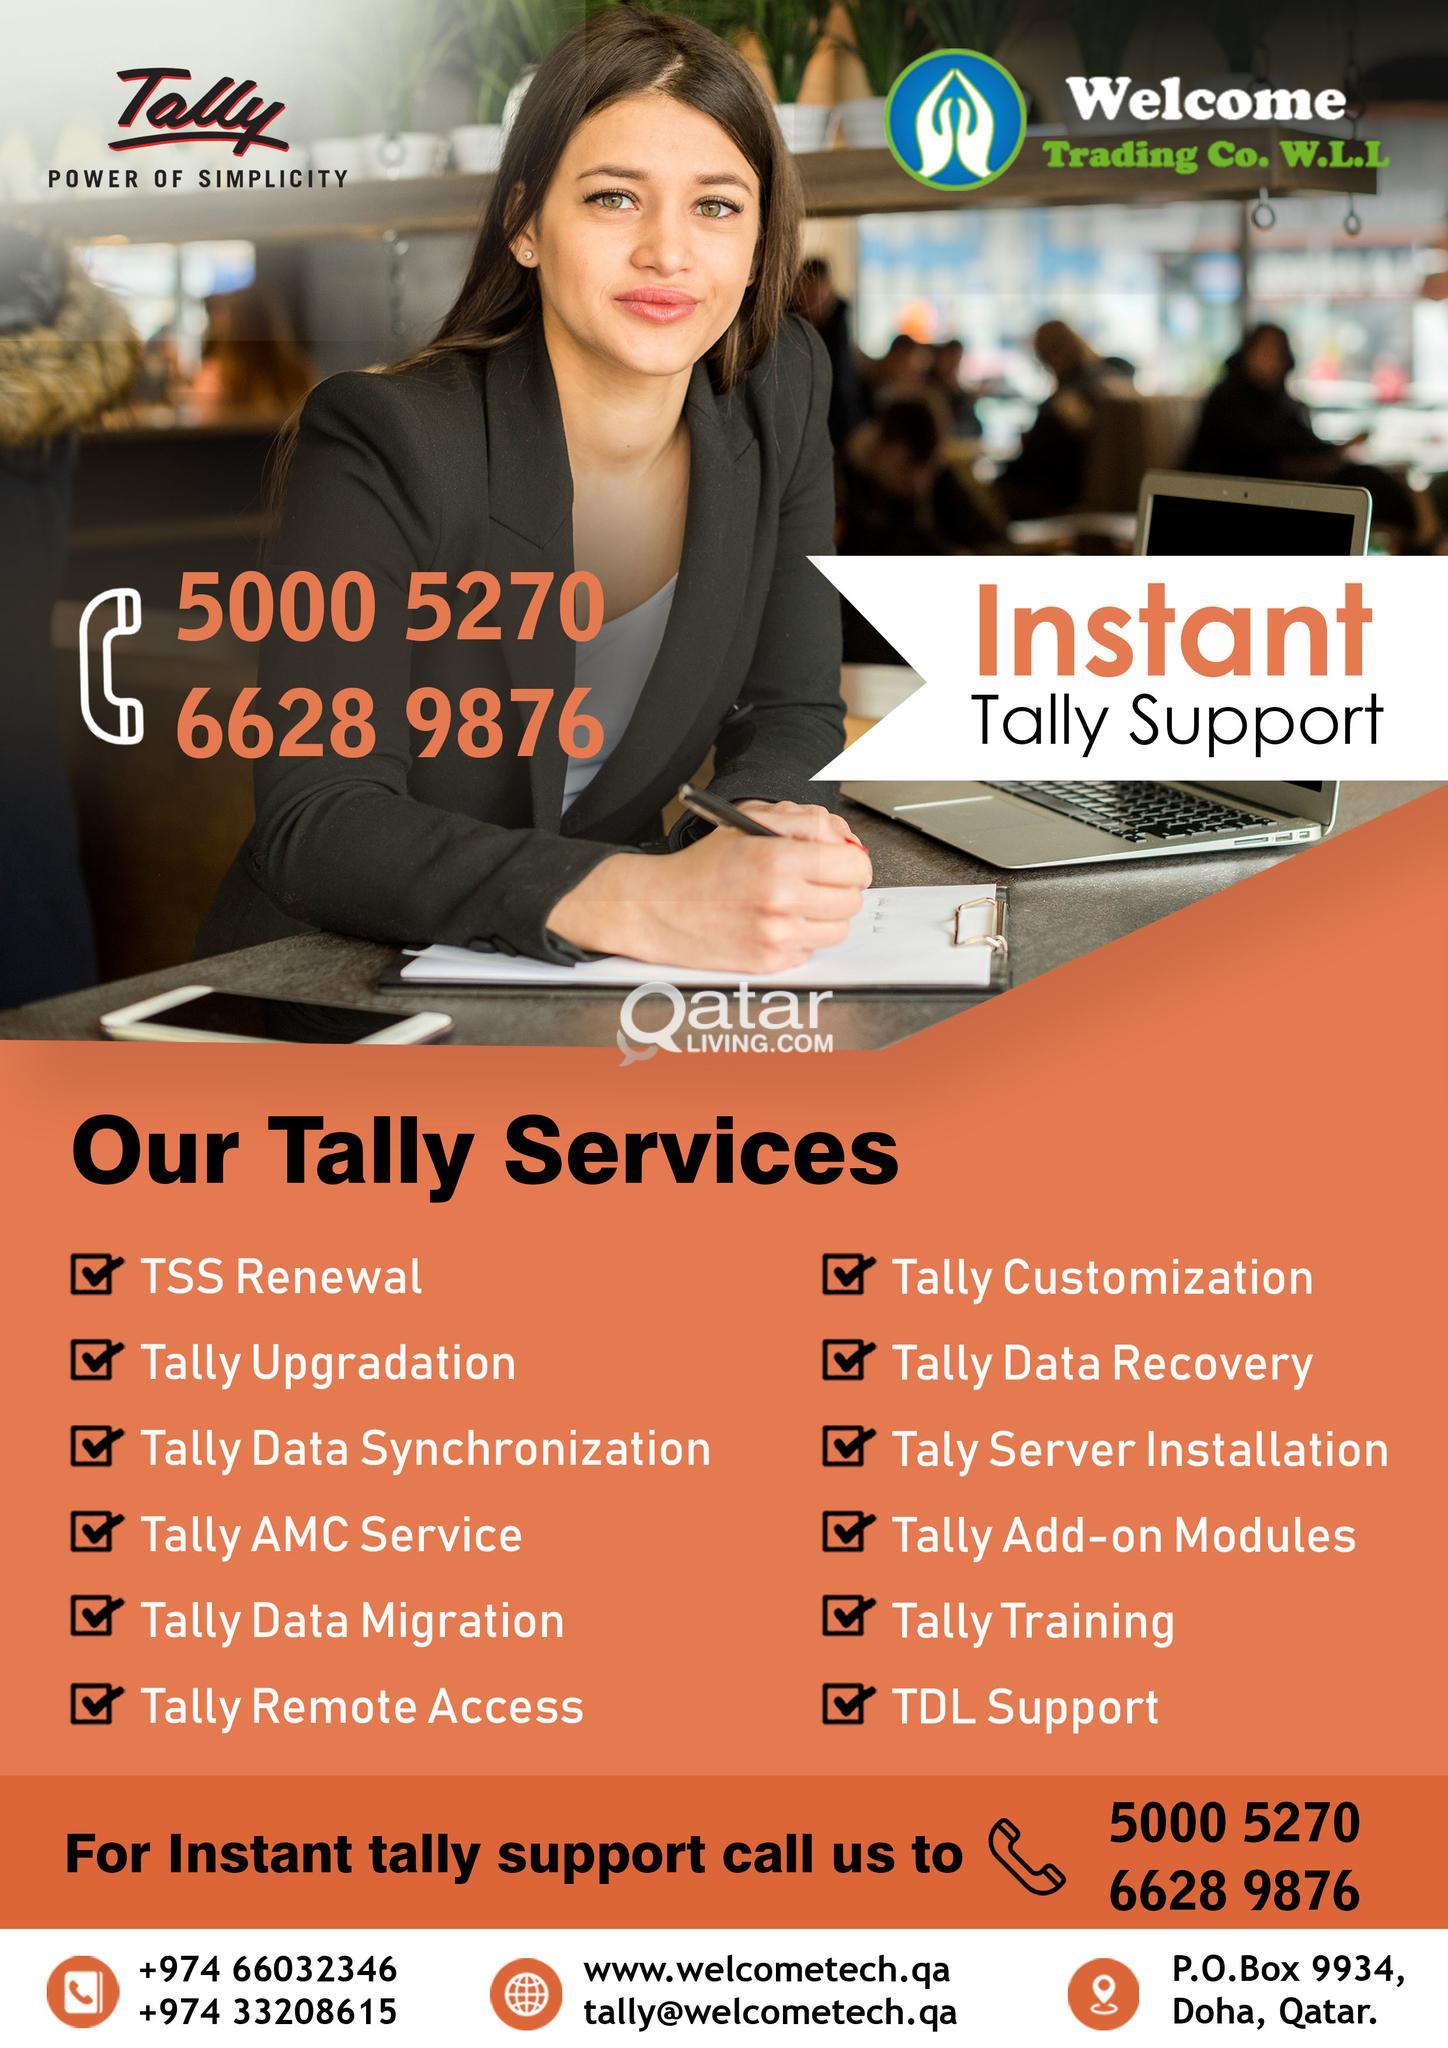 Tally Support in Qatar 24 x 7